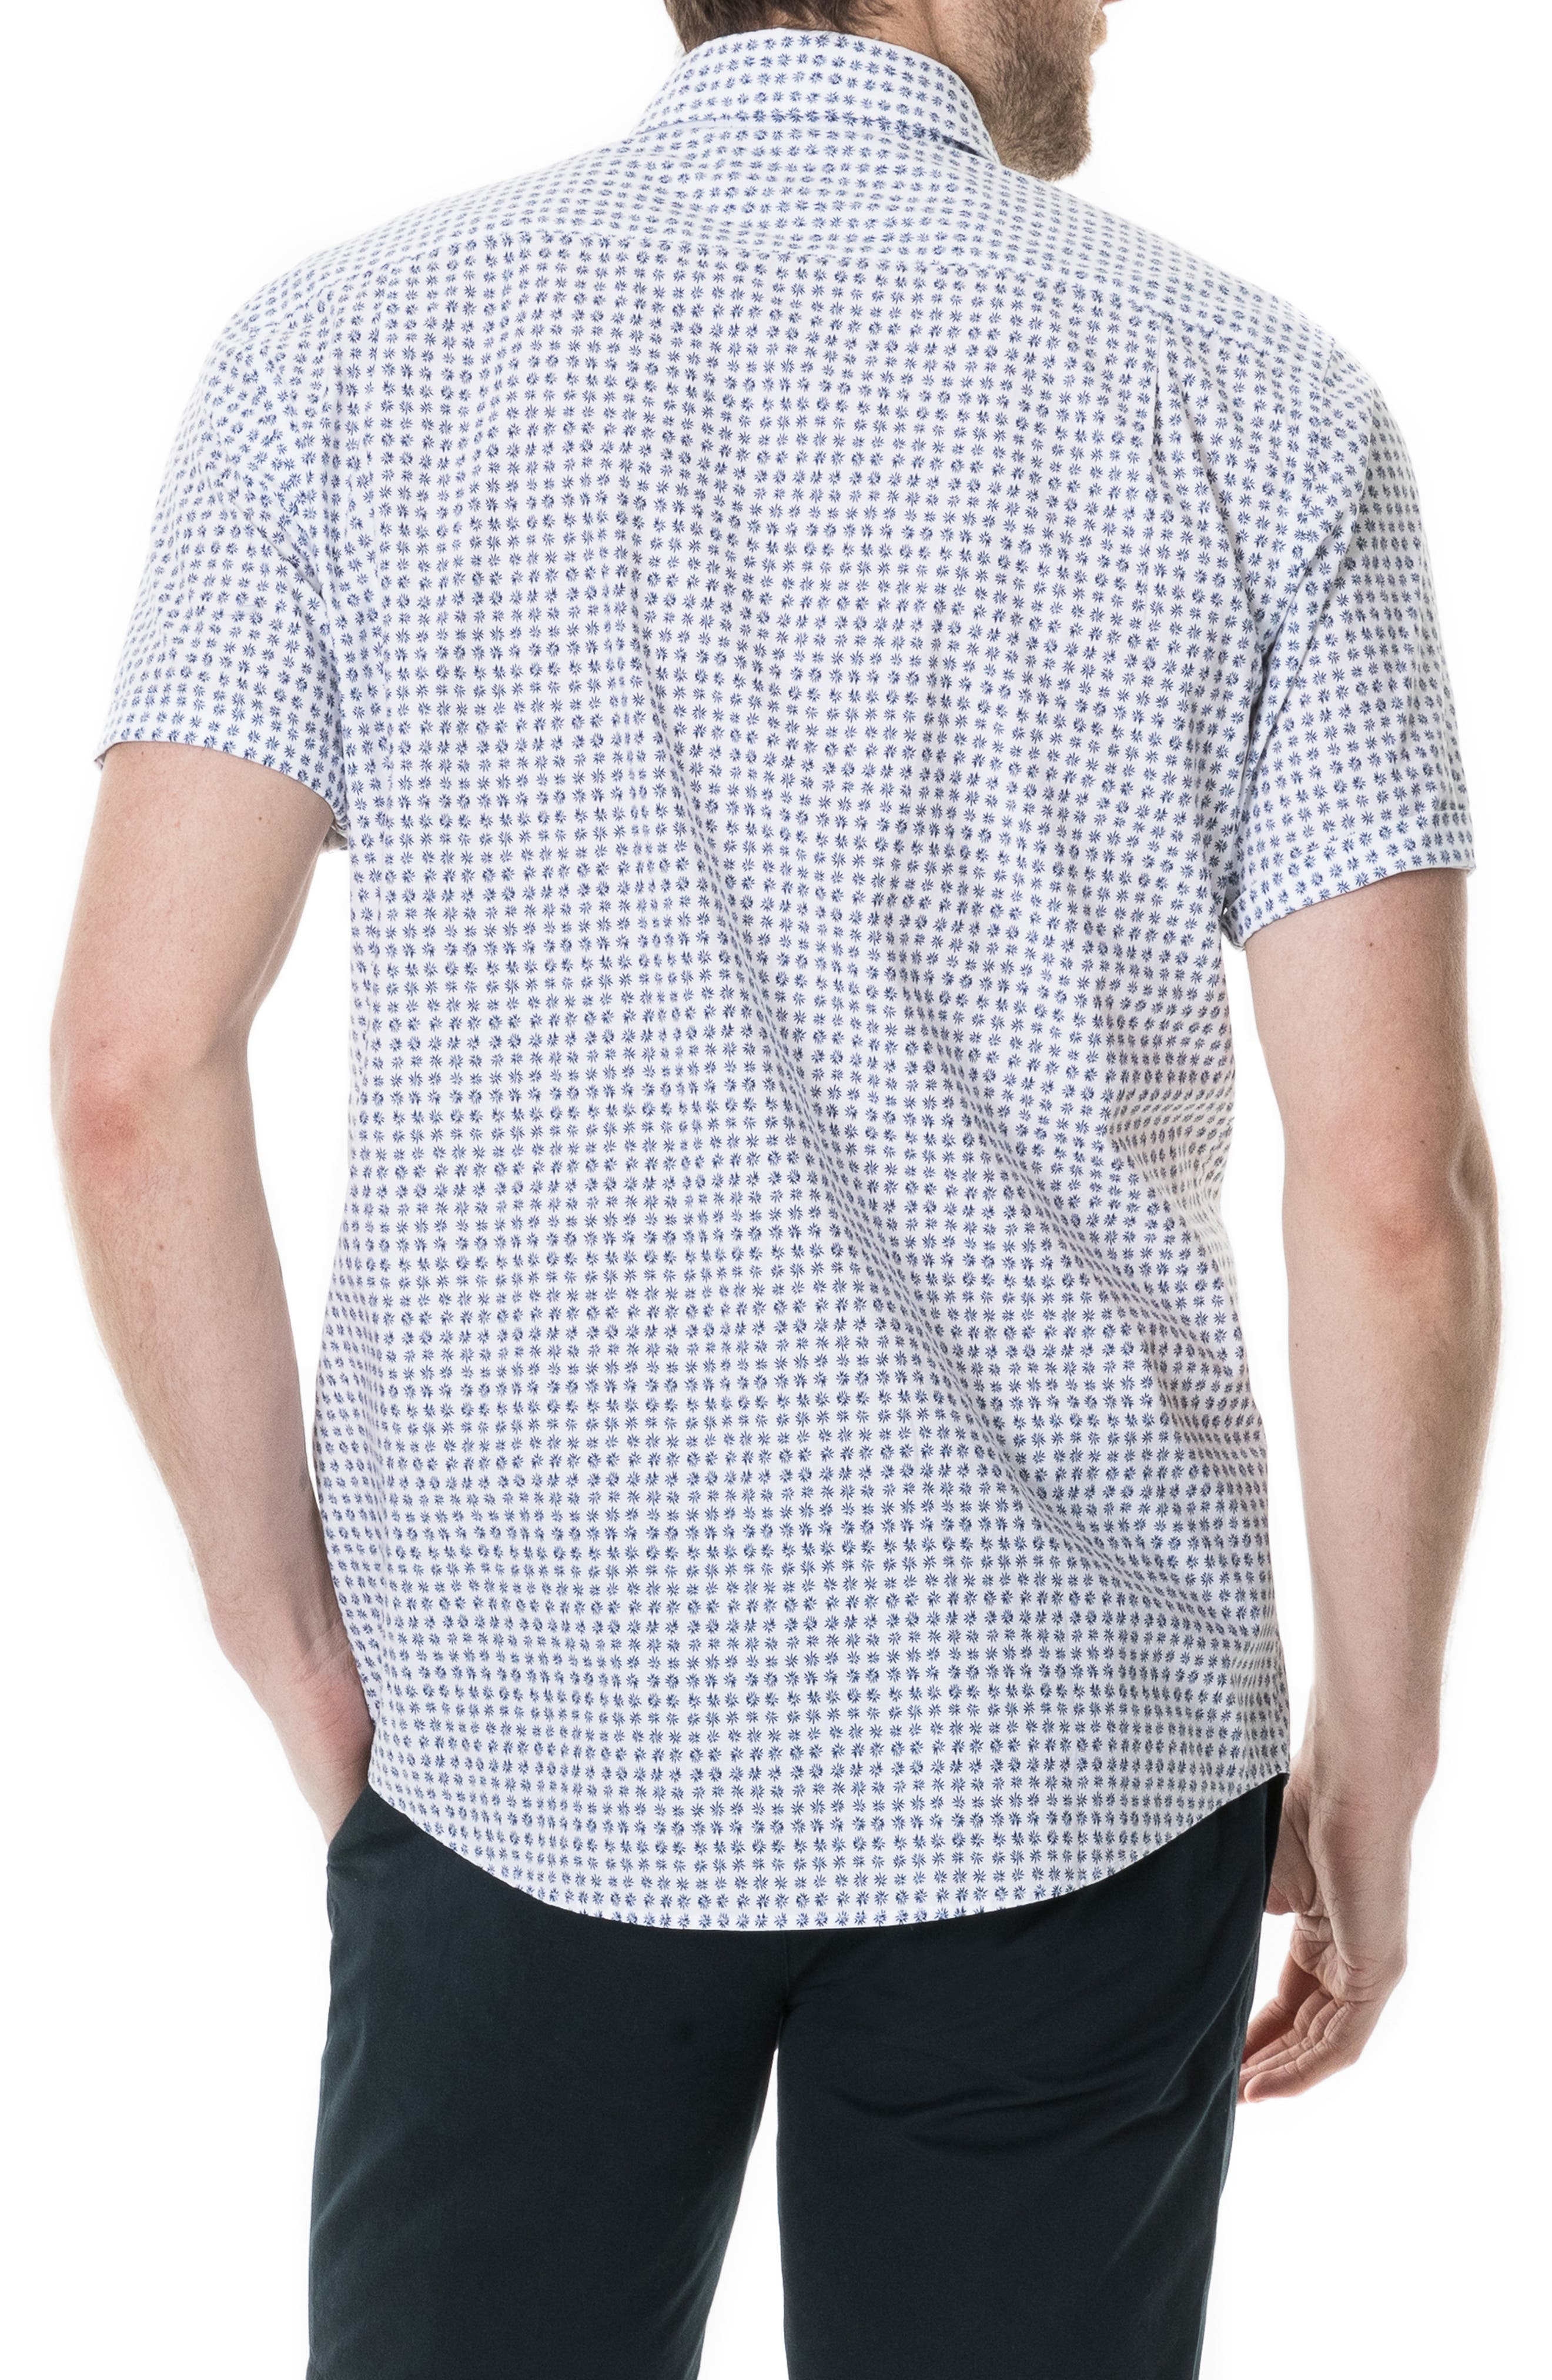 RODD & GUNN,                             Carrington Regular Fit Sport Shirt,                             Alternate thumbnail 3, color,                             SNOW